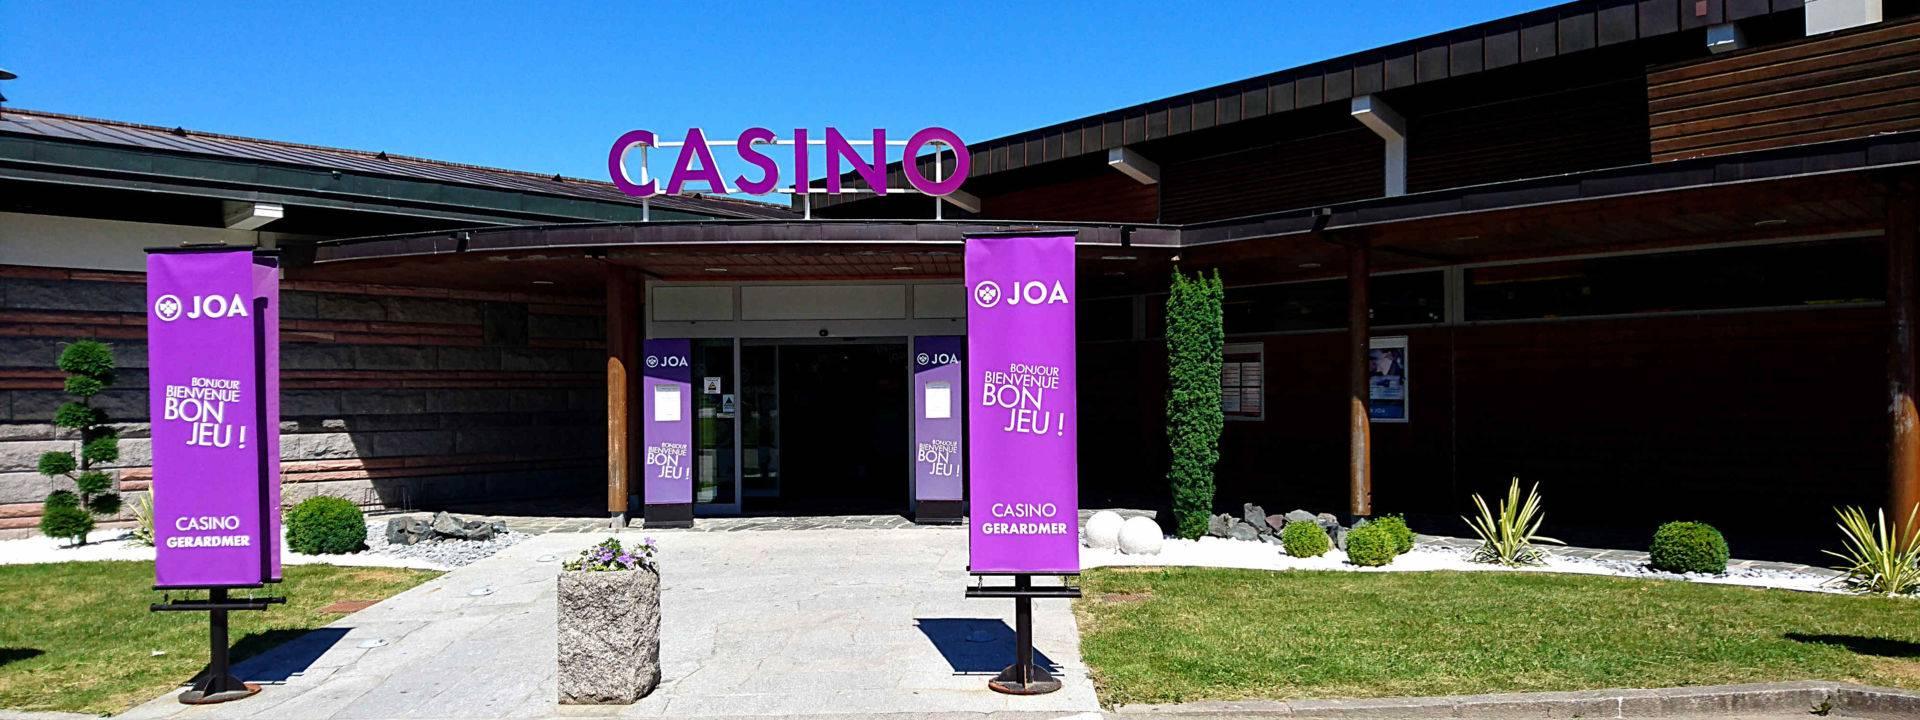 Casino joa gerardmer bismarck casino slots